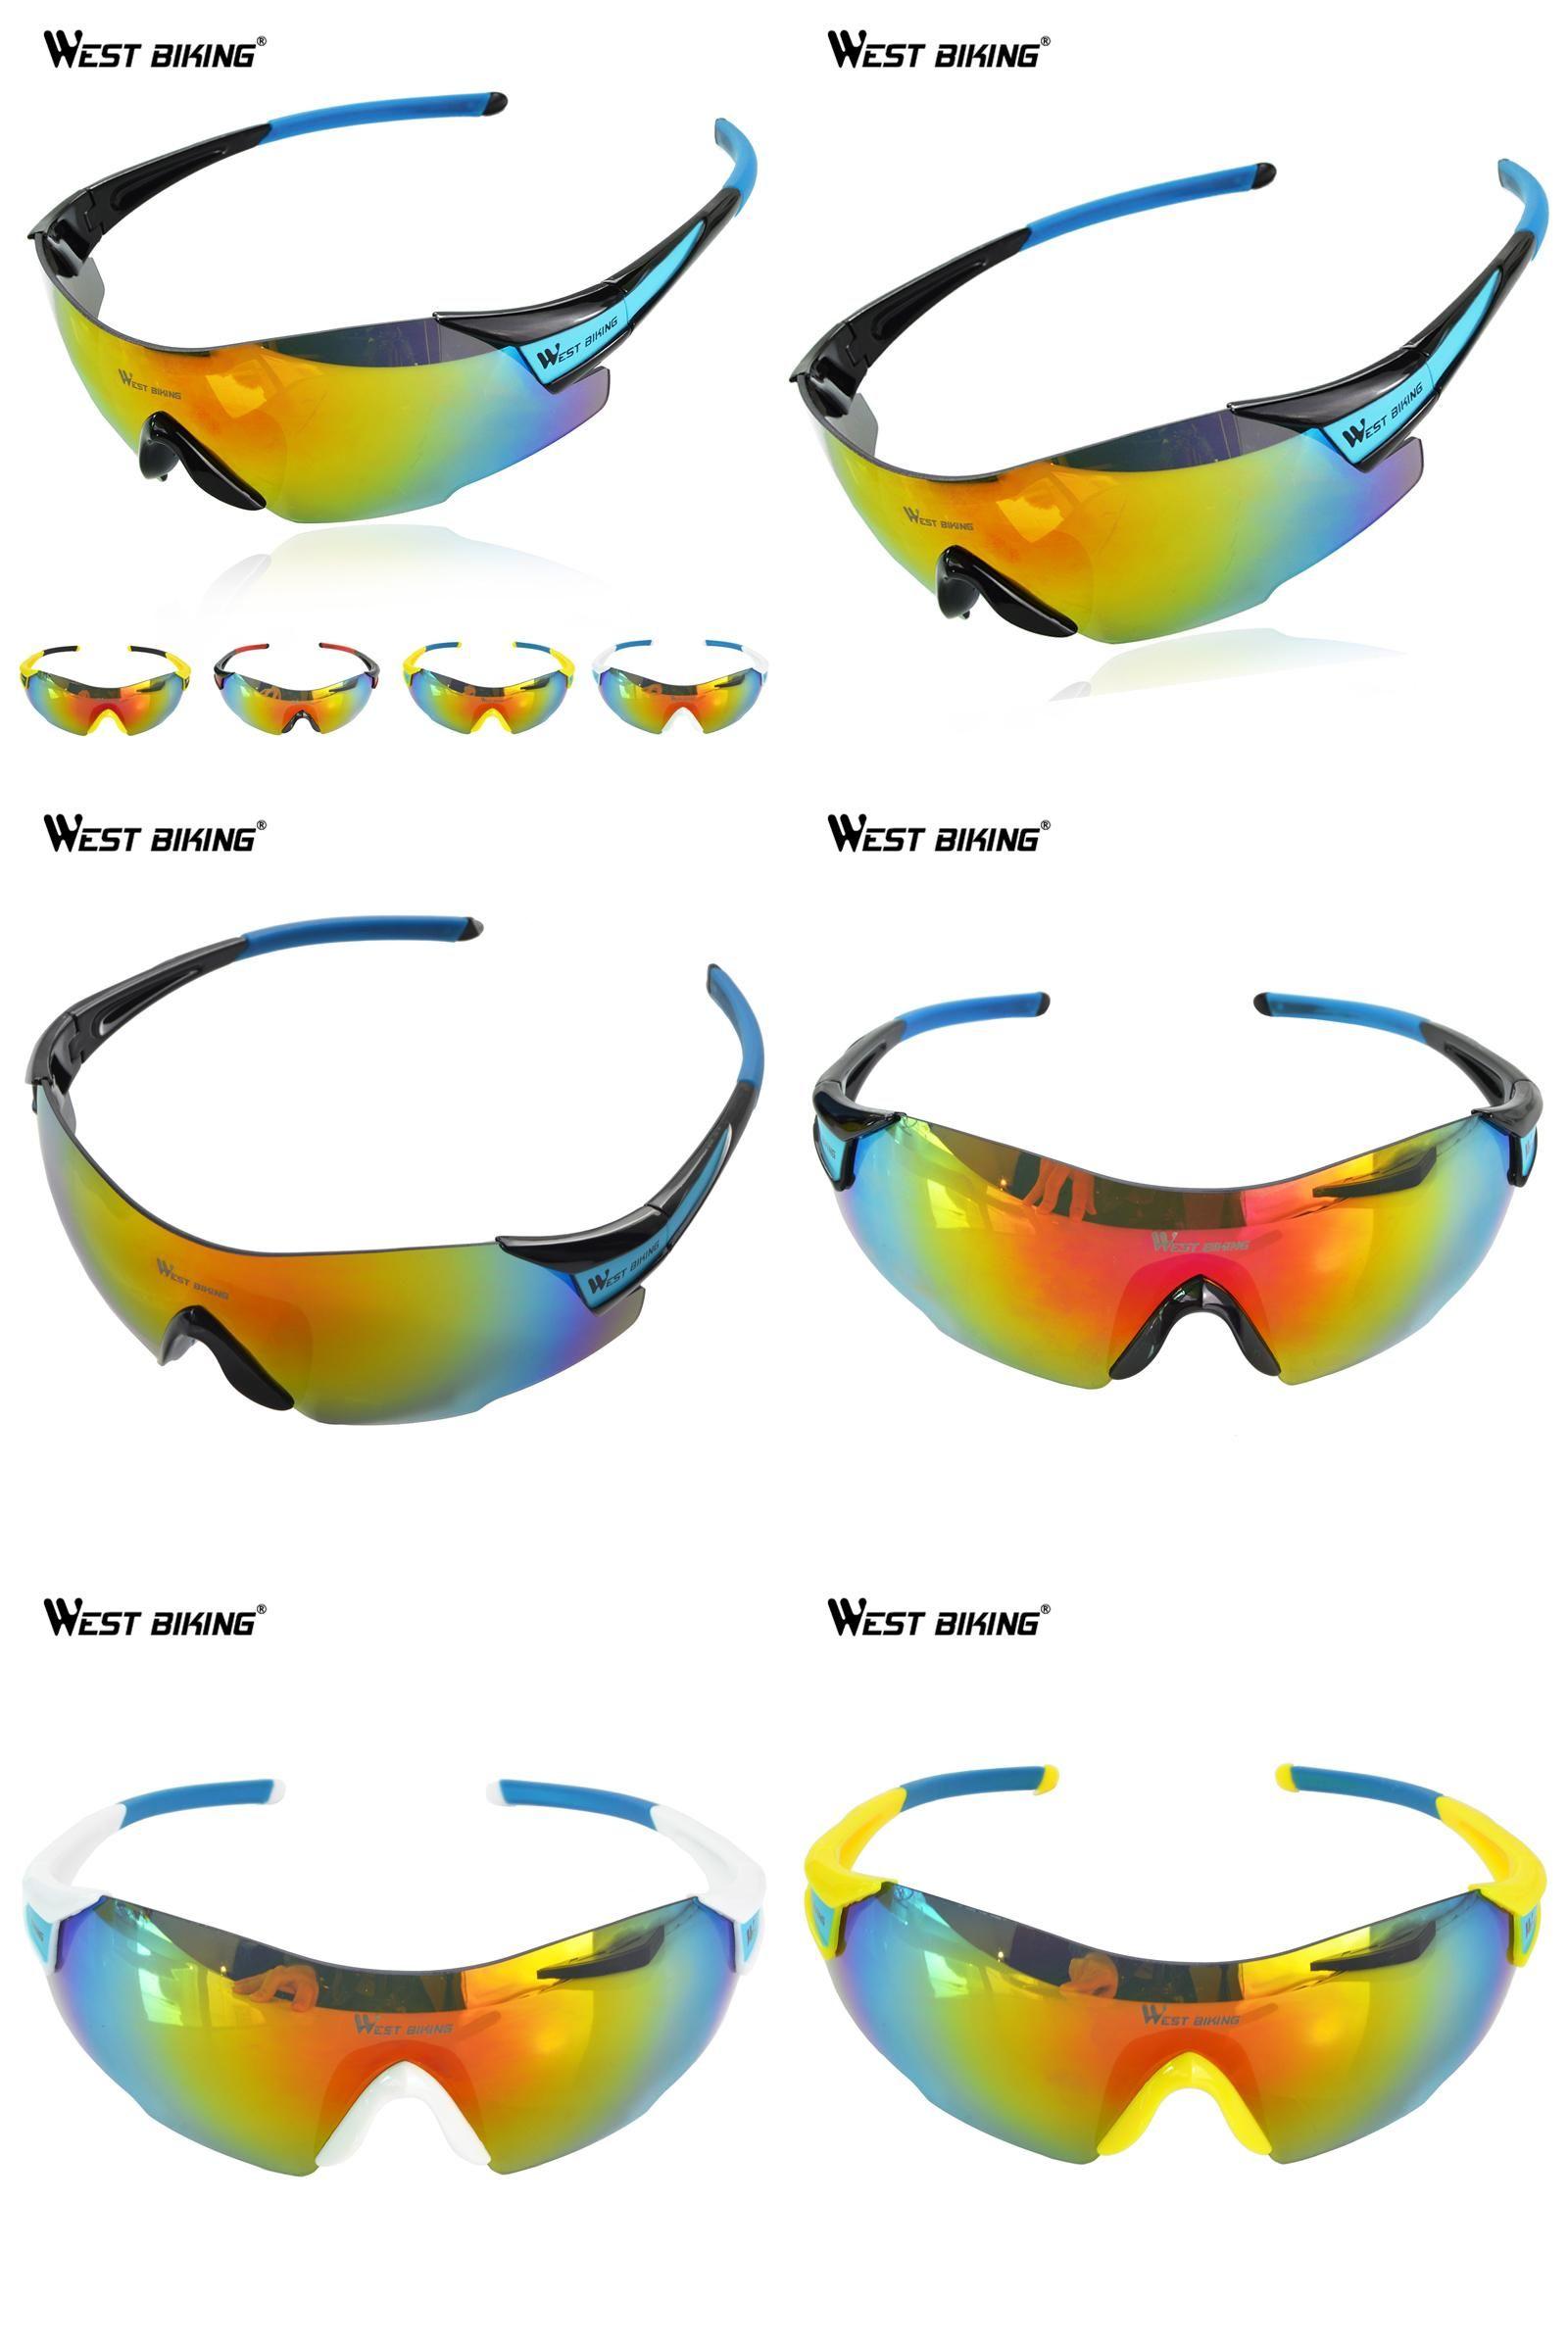 [Visit to Buy] WEST BIKING Bike Glasses Men Woman Sports Sunglasses Sunscreen Anti-UV Bicycle Eyewear Windproof Bicycle Bike Cycling Glasses #Advertisement